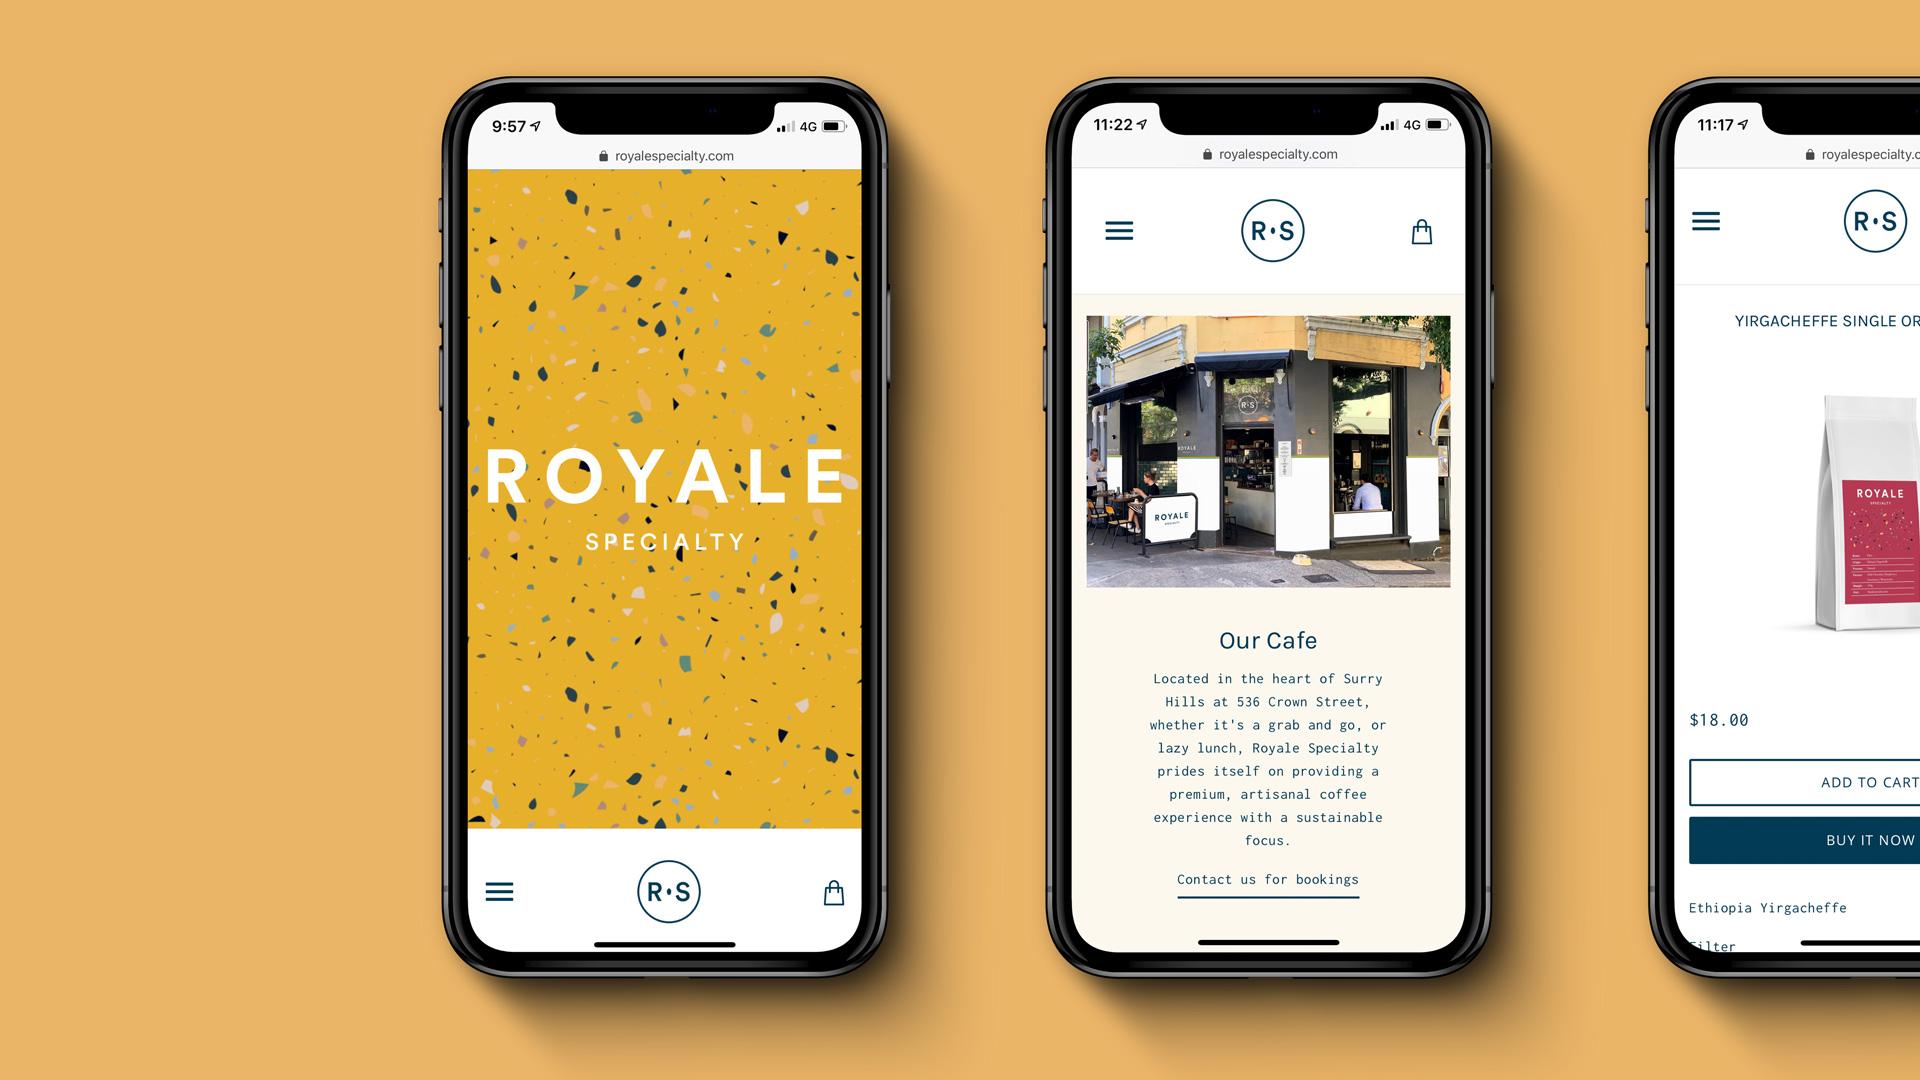 Nectar-&-Co-Royale-Specialty-Cafe-Shopify-Web-Design.jpg